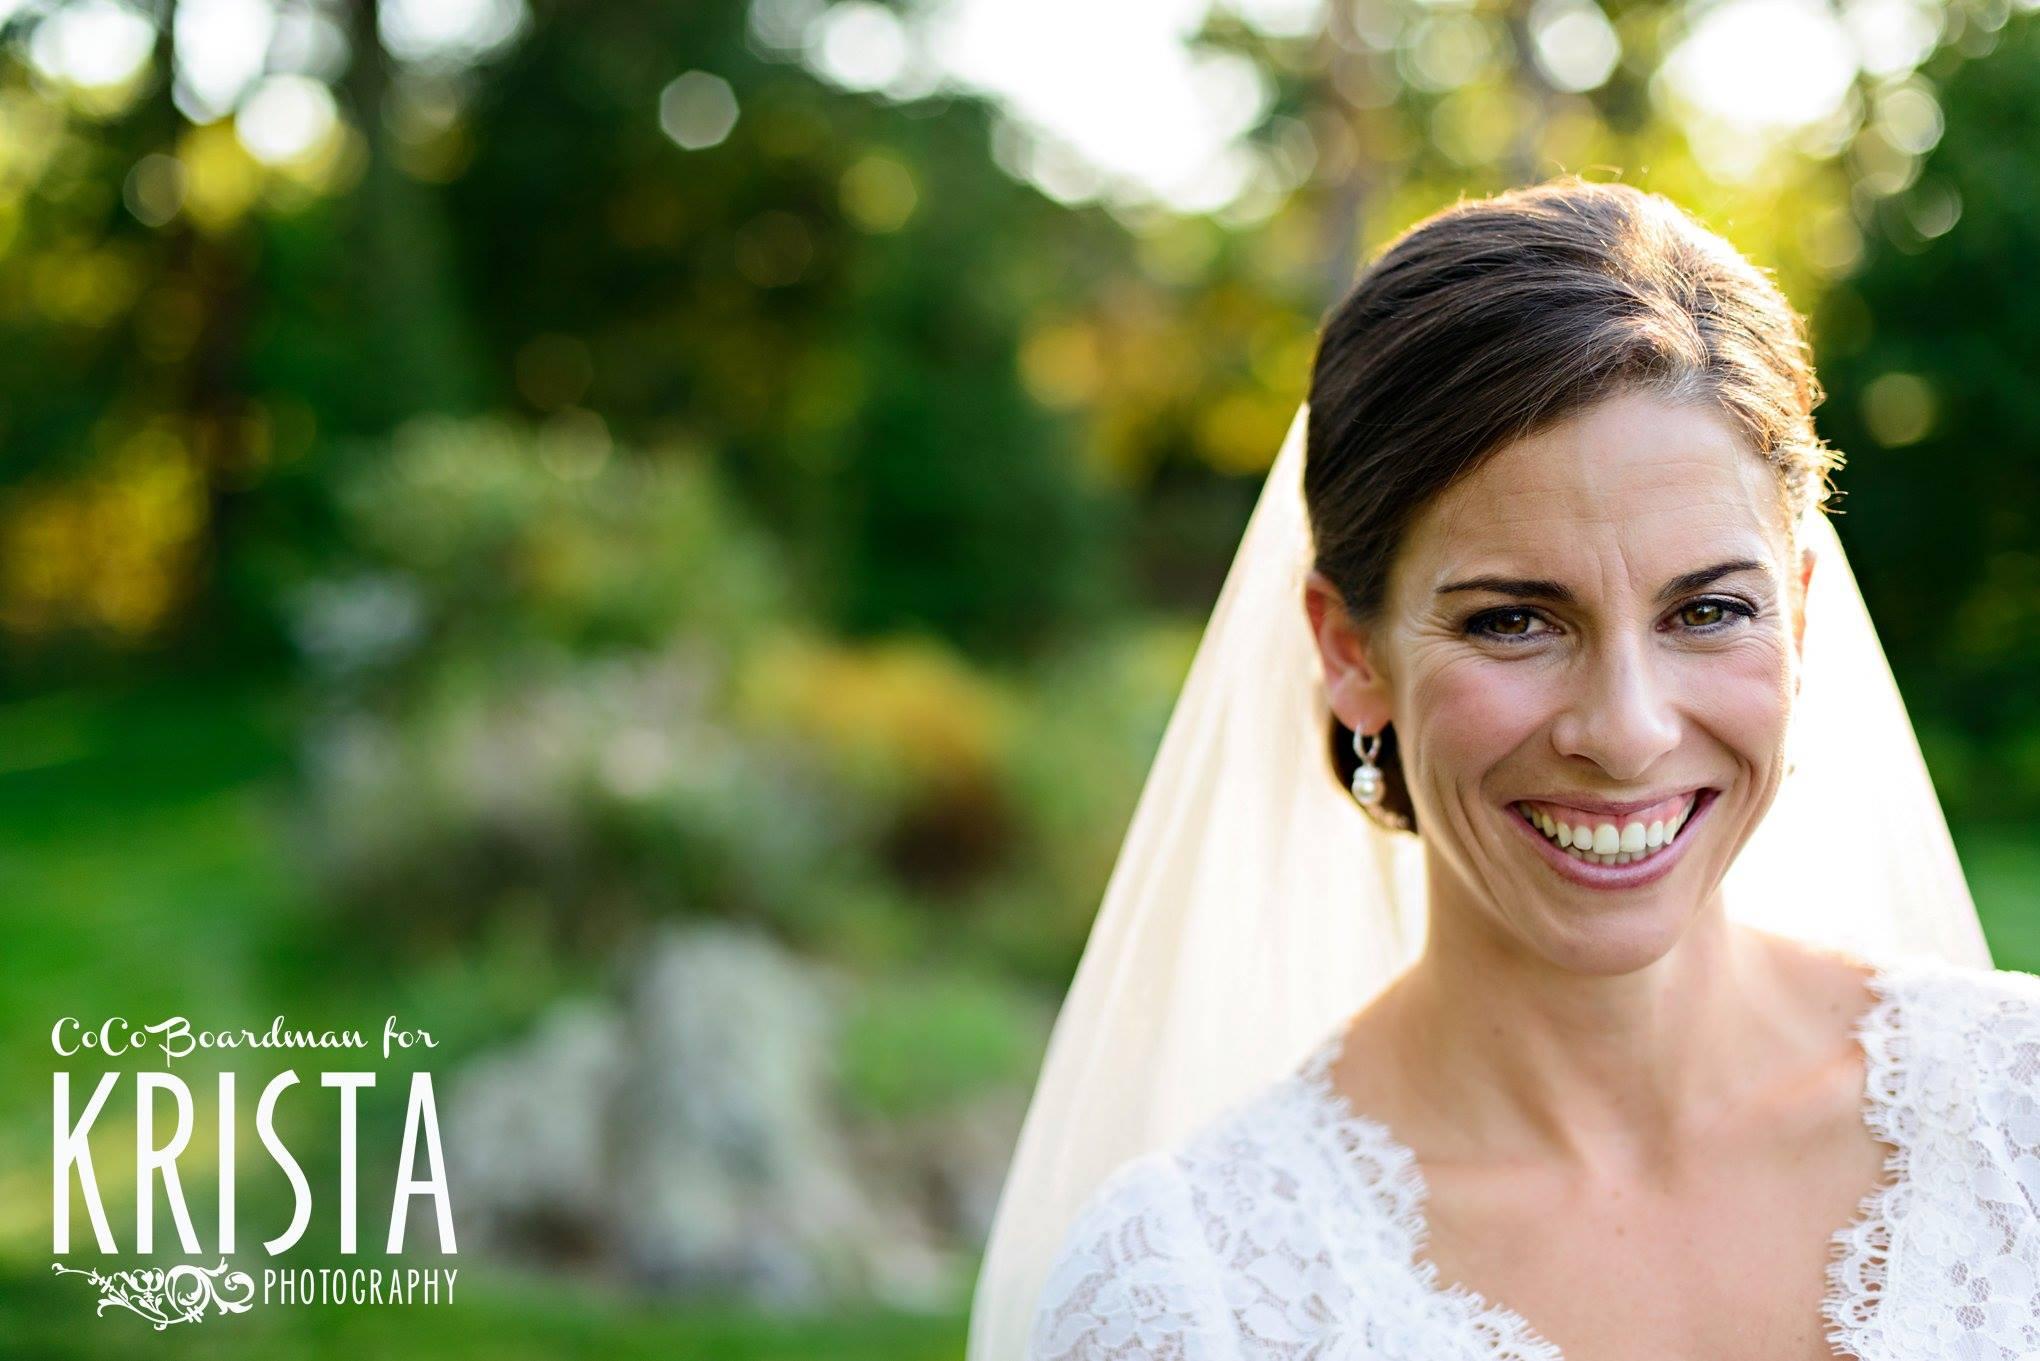 new-england-bride-wedding-painting-krista-photography-boston-wedding-painter